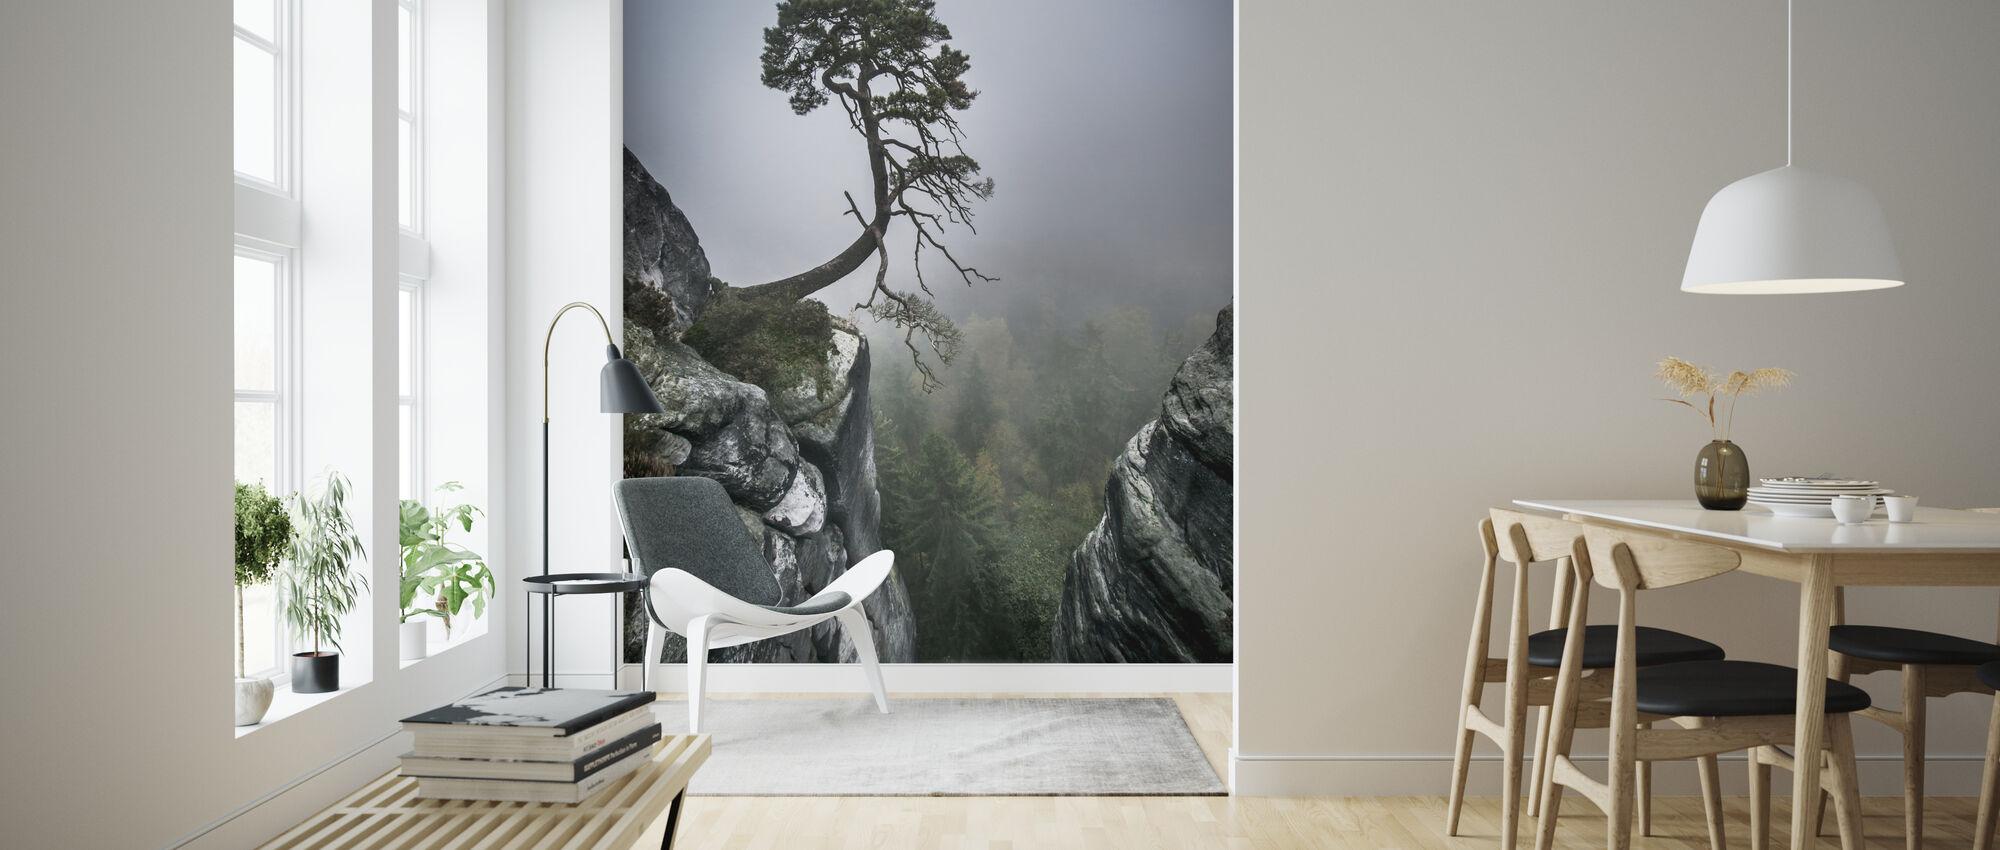 Tree on Mountain - Wallpaper - Living Room